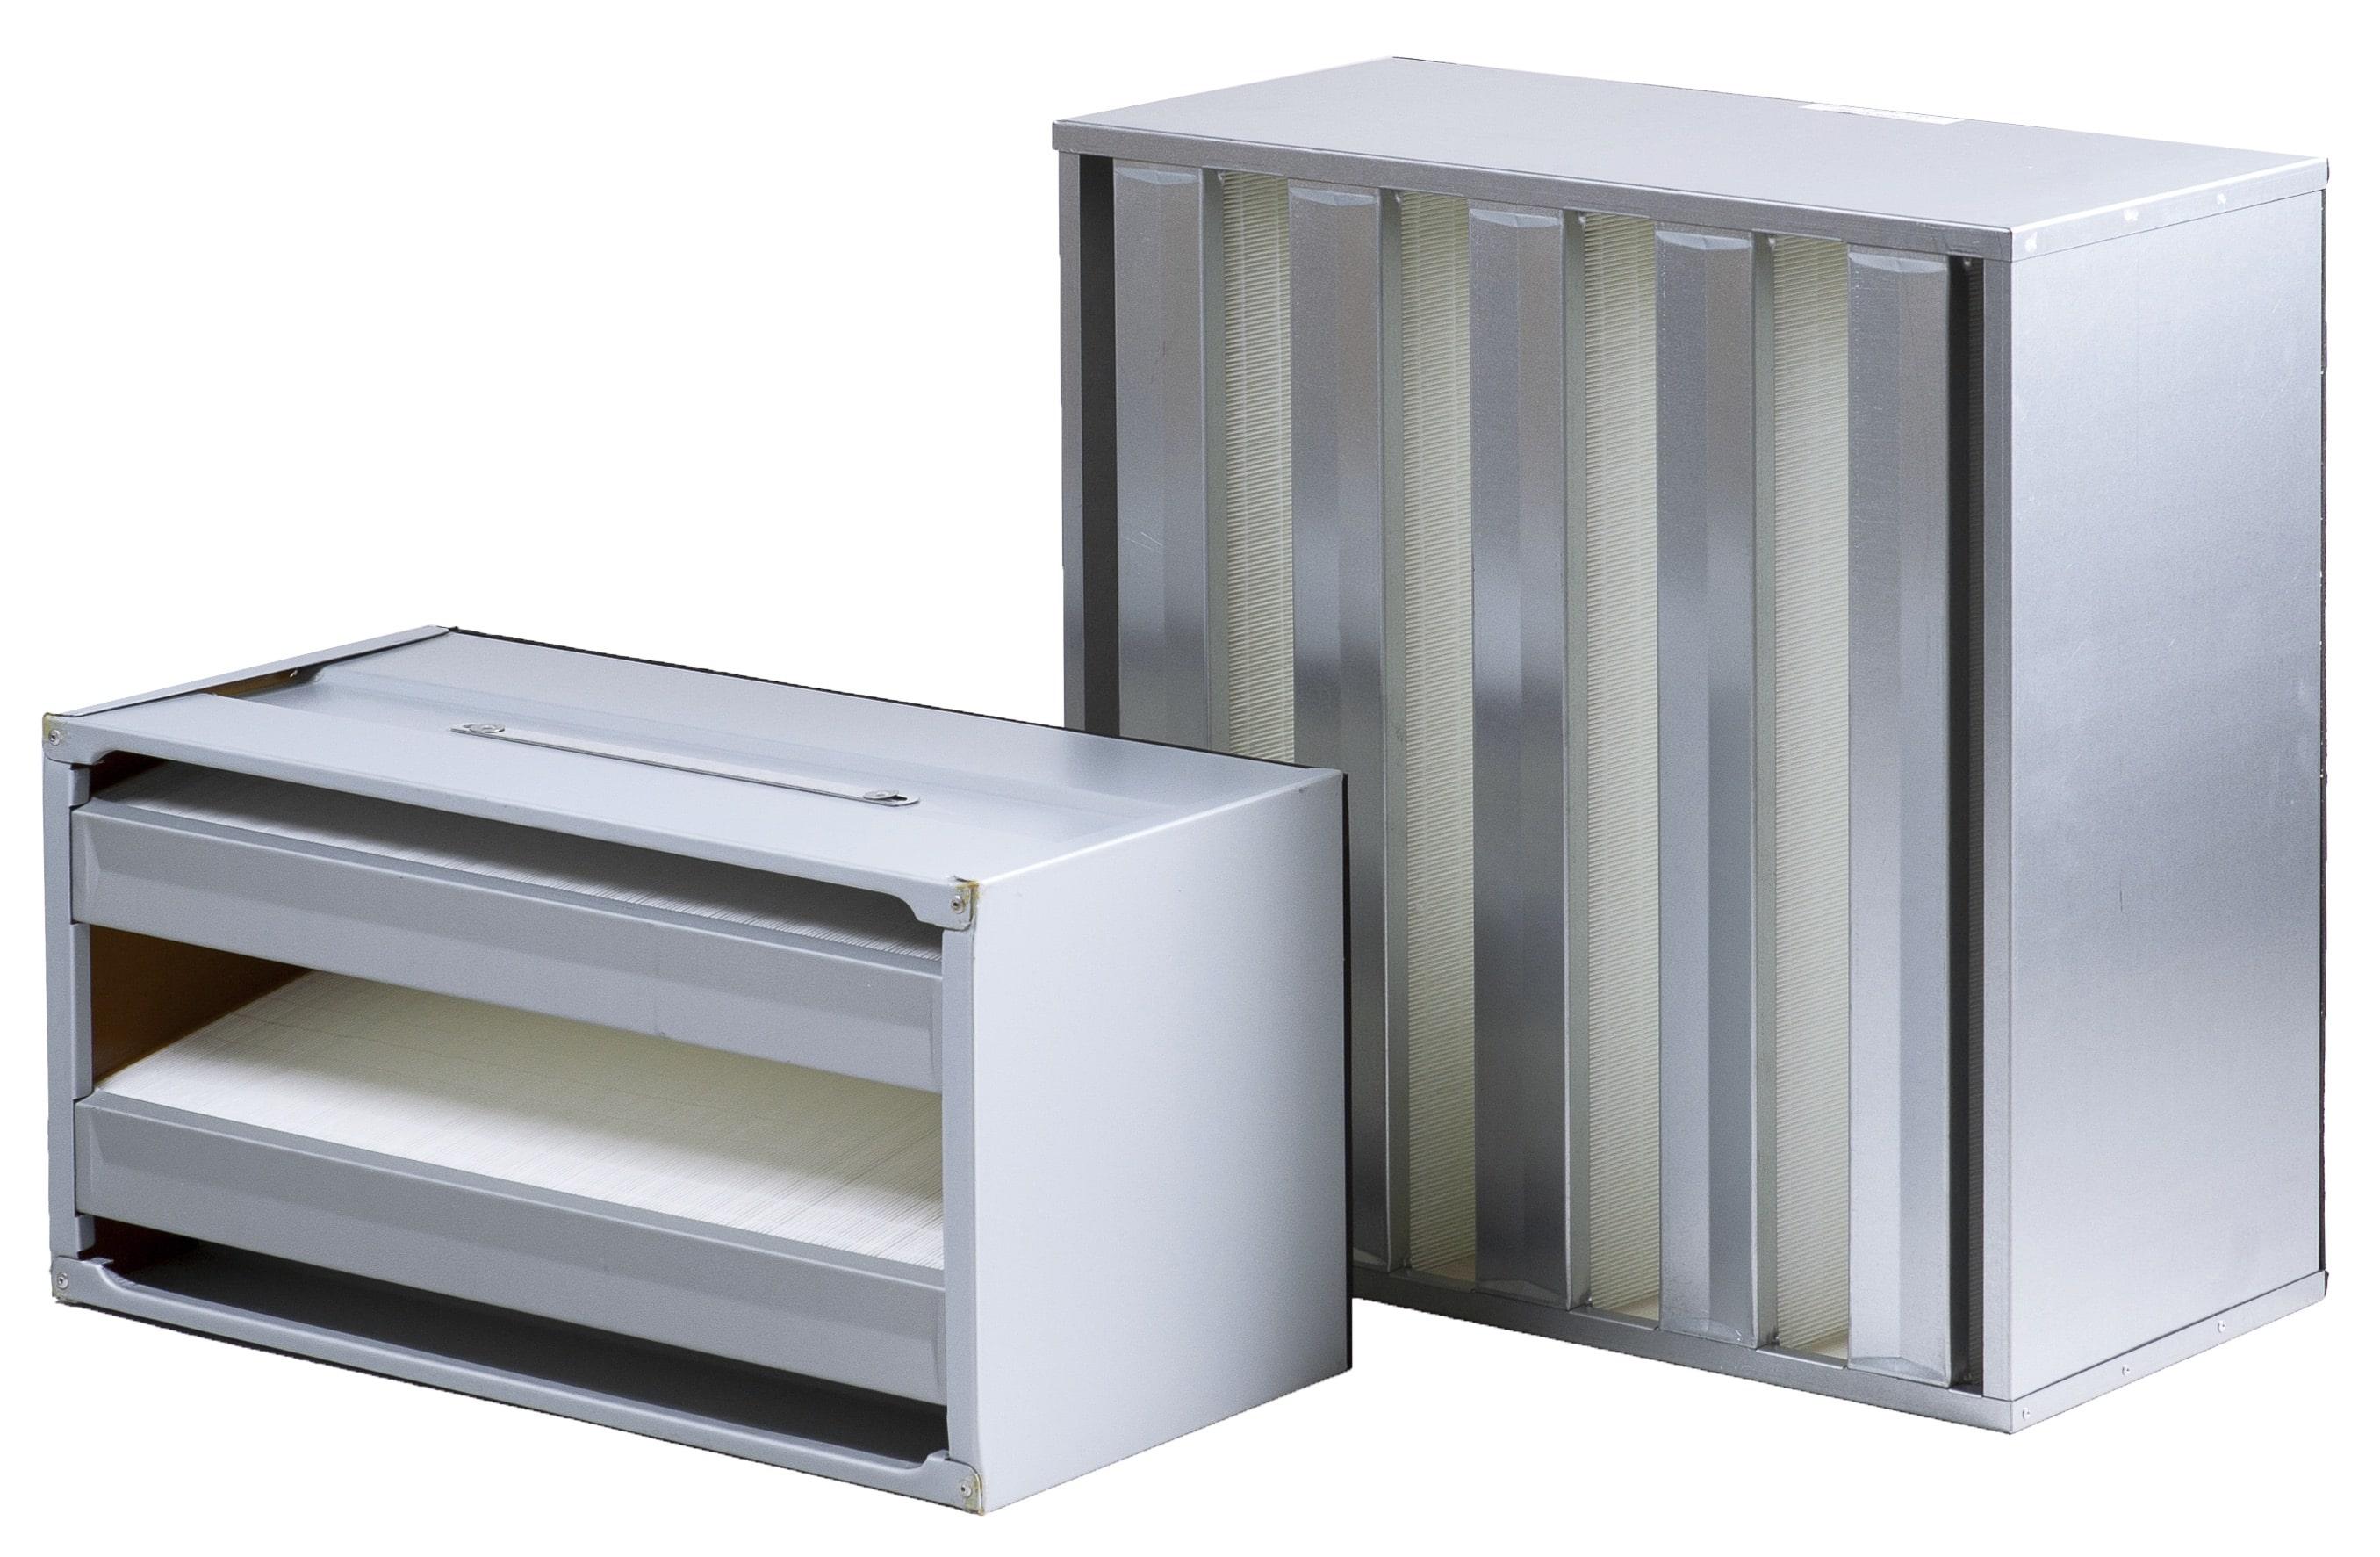 HV High Volume HEPA Air Filter